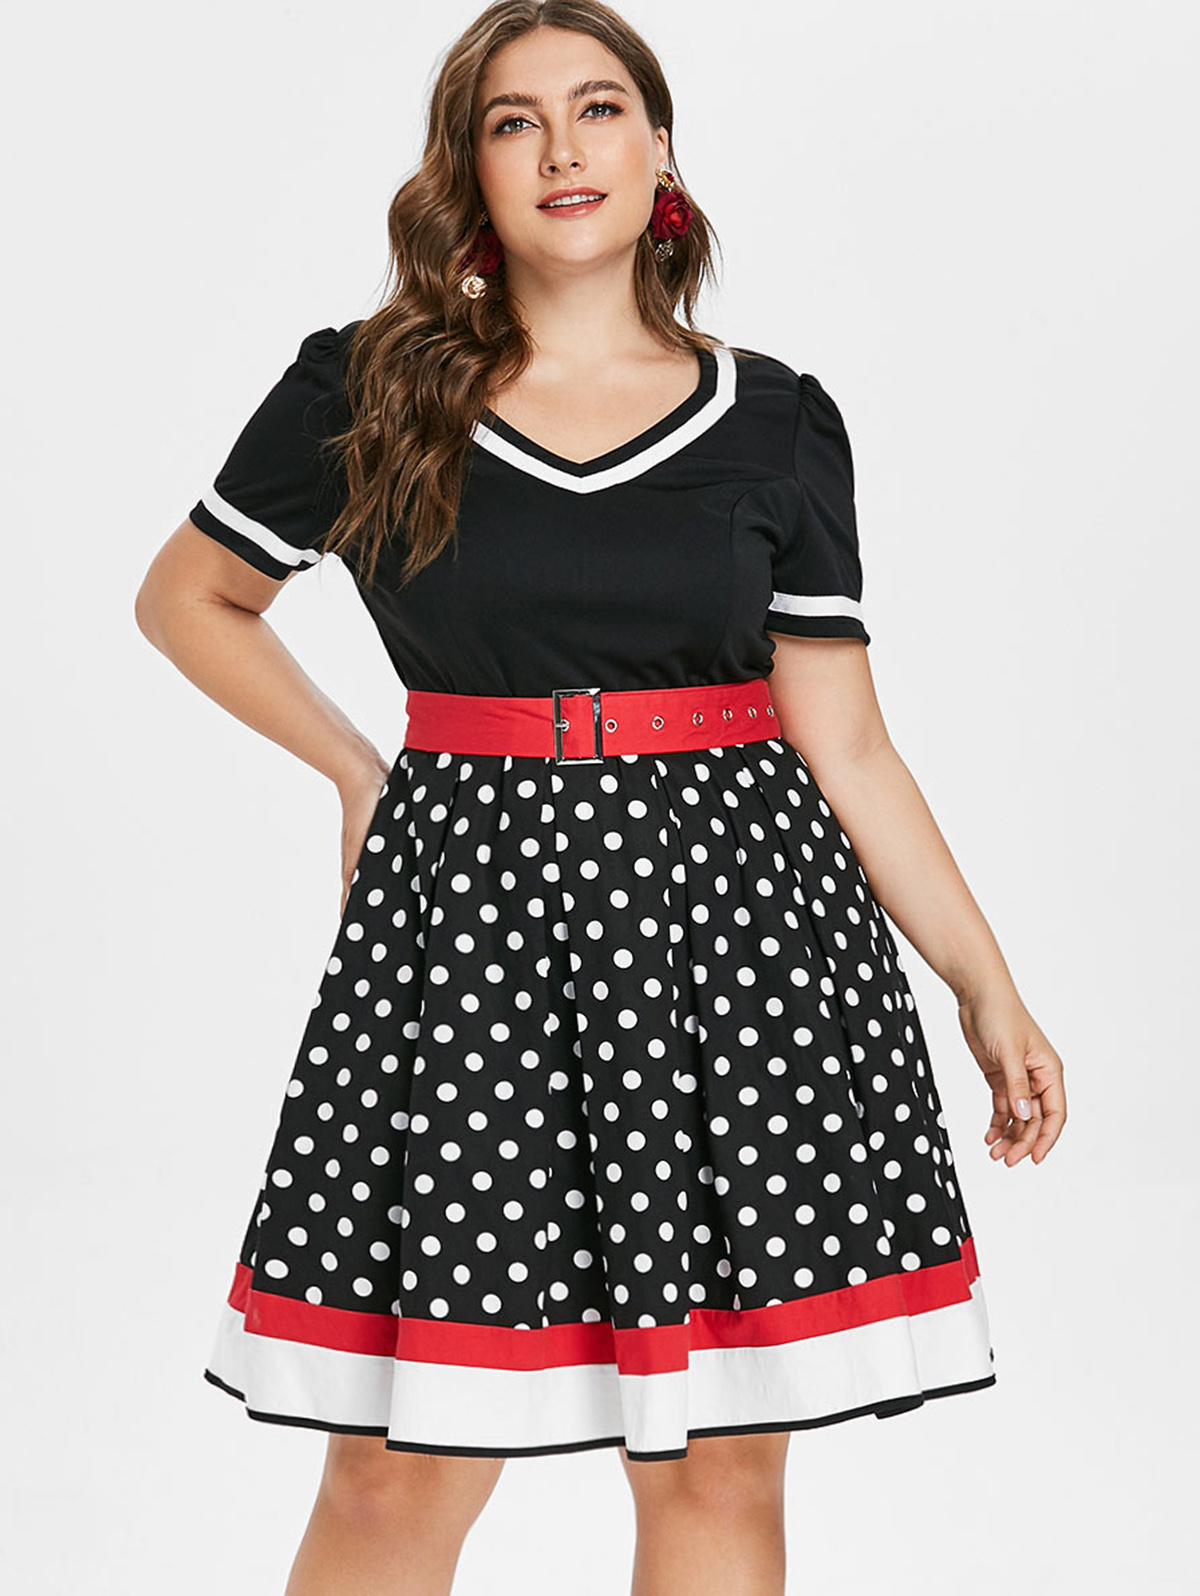 Wipalo Plus Size Polka Dot Vintage Dress Women Color Block Cotton Belt Summer  Dress Retro 50s 5c8f8ea1b482